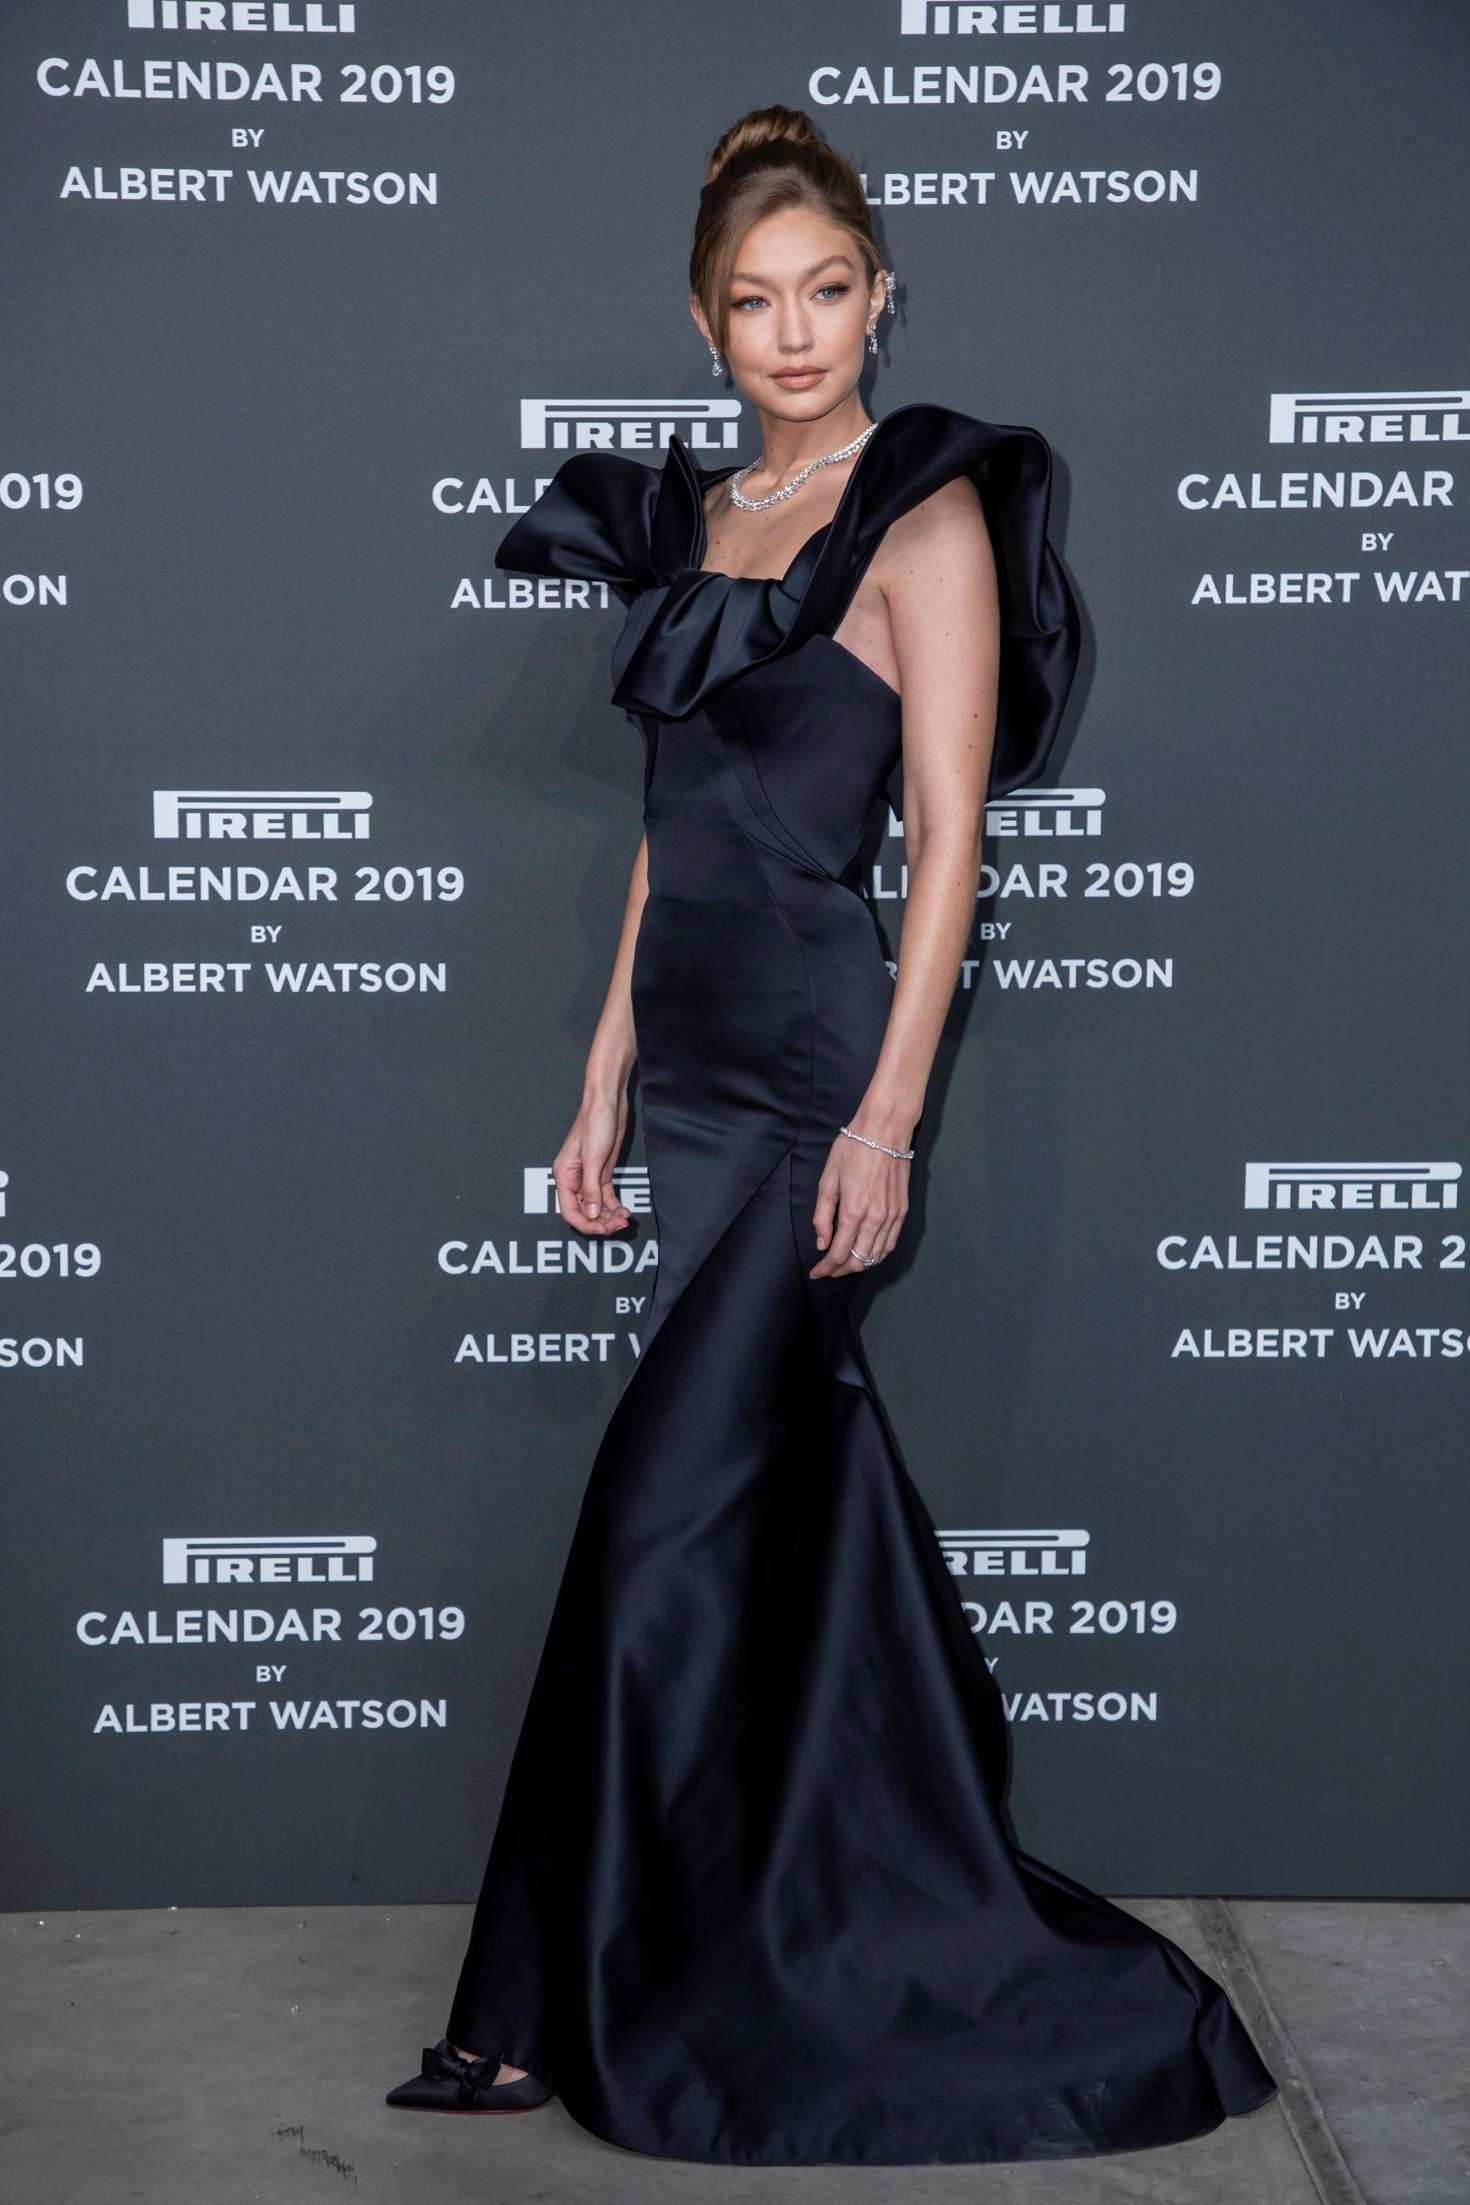 Gigi Hadid In Zac Posen At 2019 Pirelli Calendar Launch Gala In